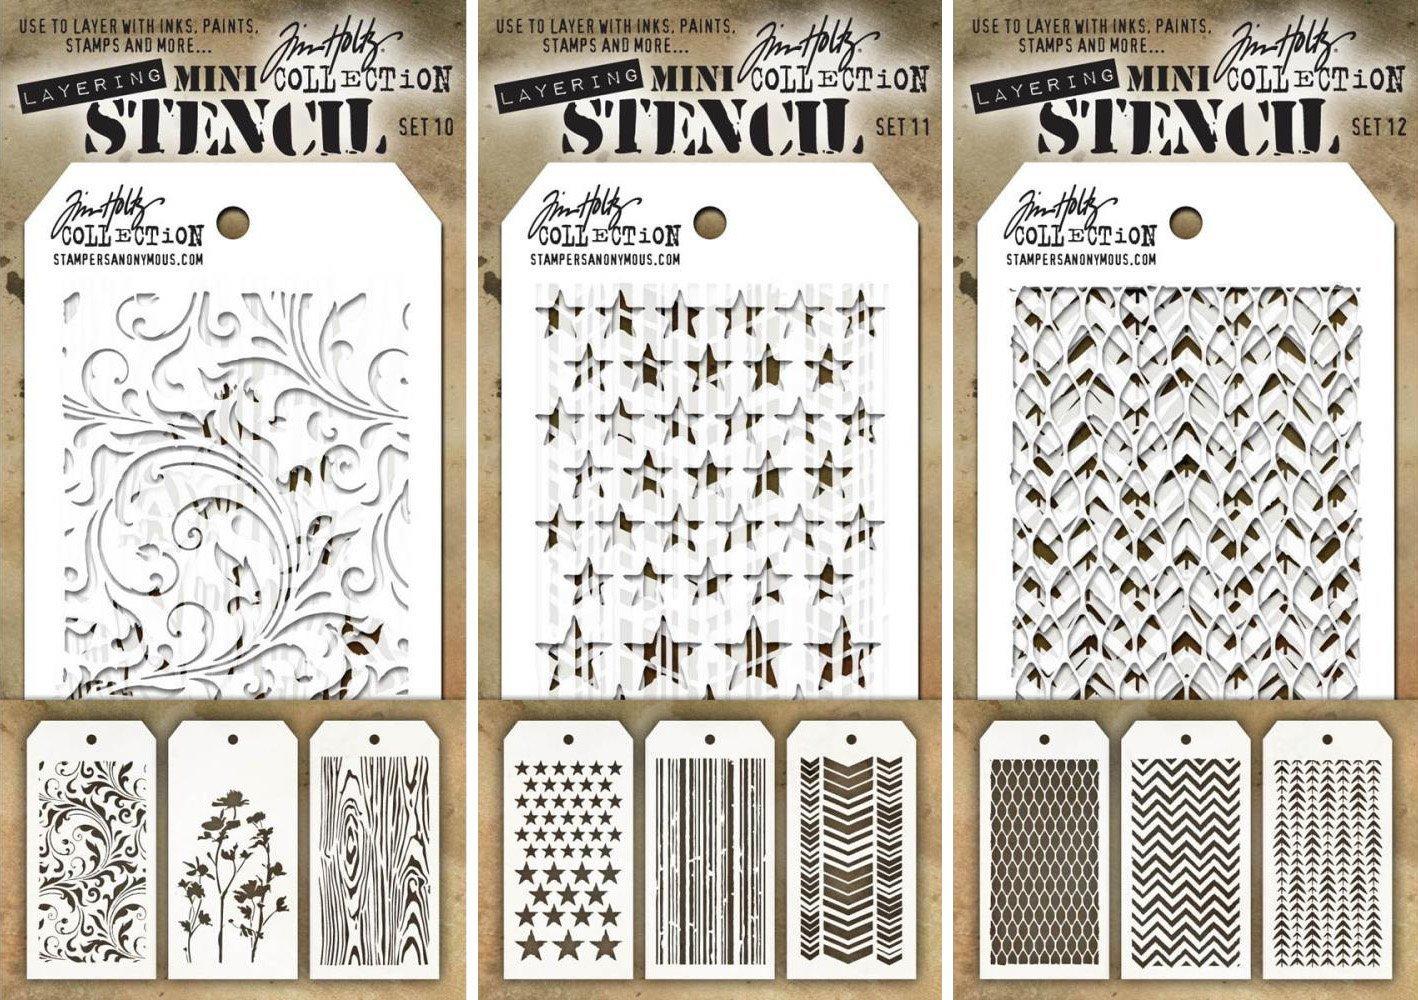 Tim Holtz - Nine Mini Layering Stencils - Flourish, Wildflower, Woodgrain, Stars, Stripes, Chevron, Mesh, Zigzag and Tracks - aka sets 10, 11 & 12